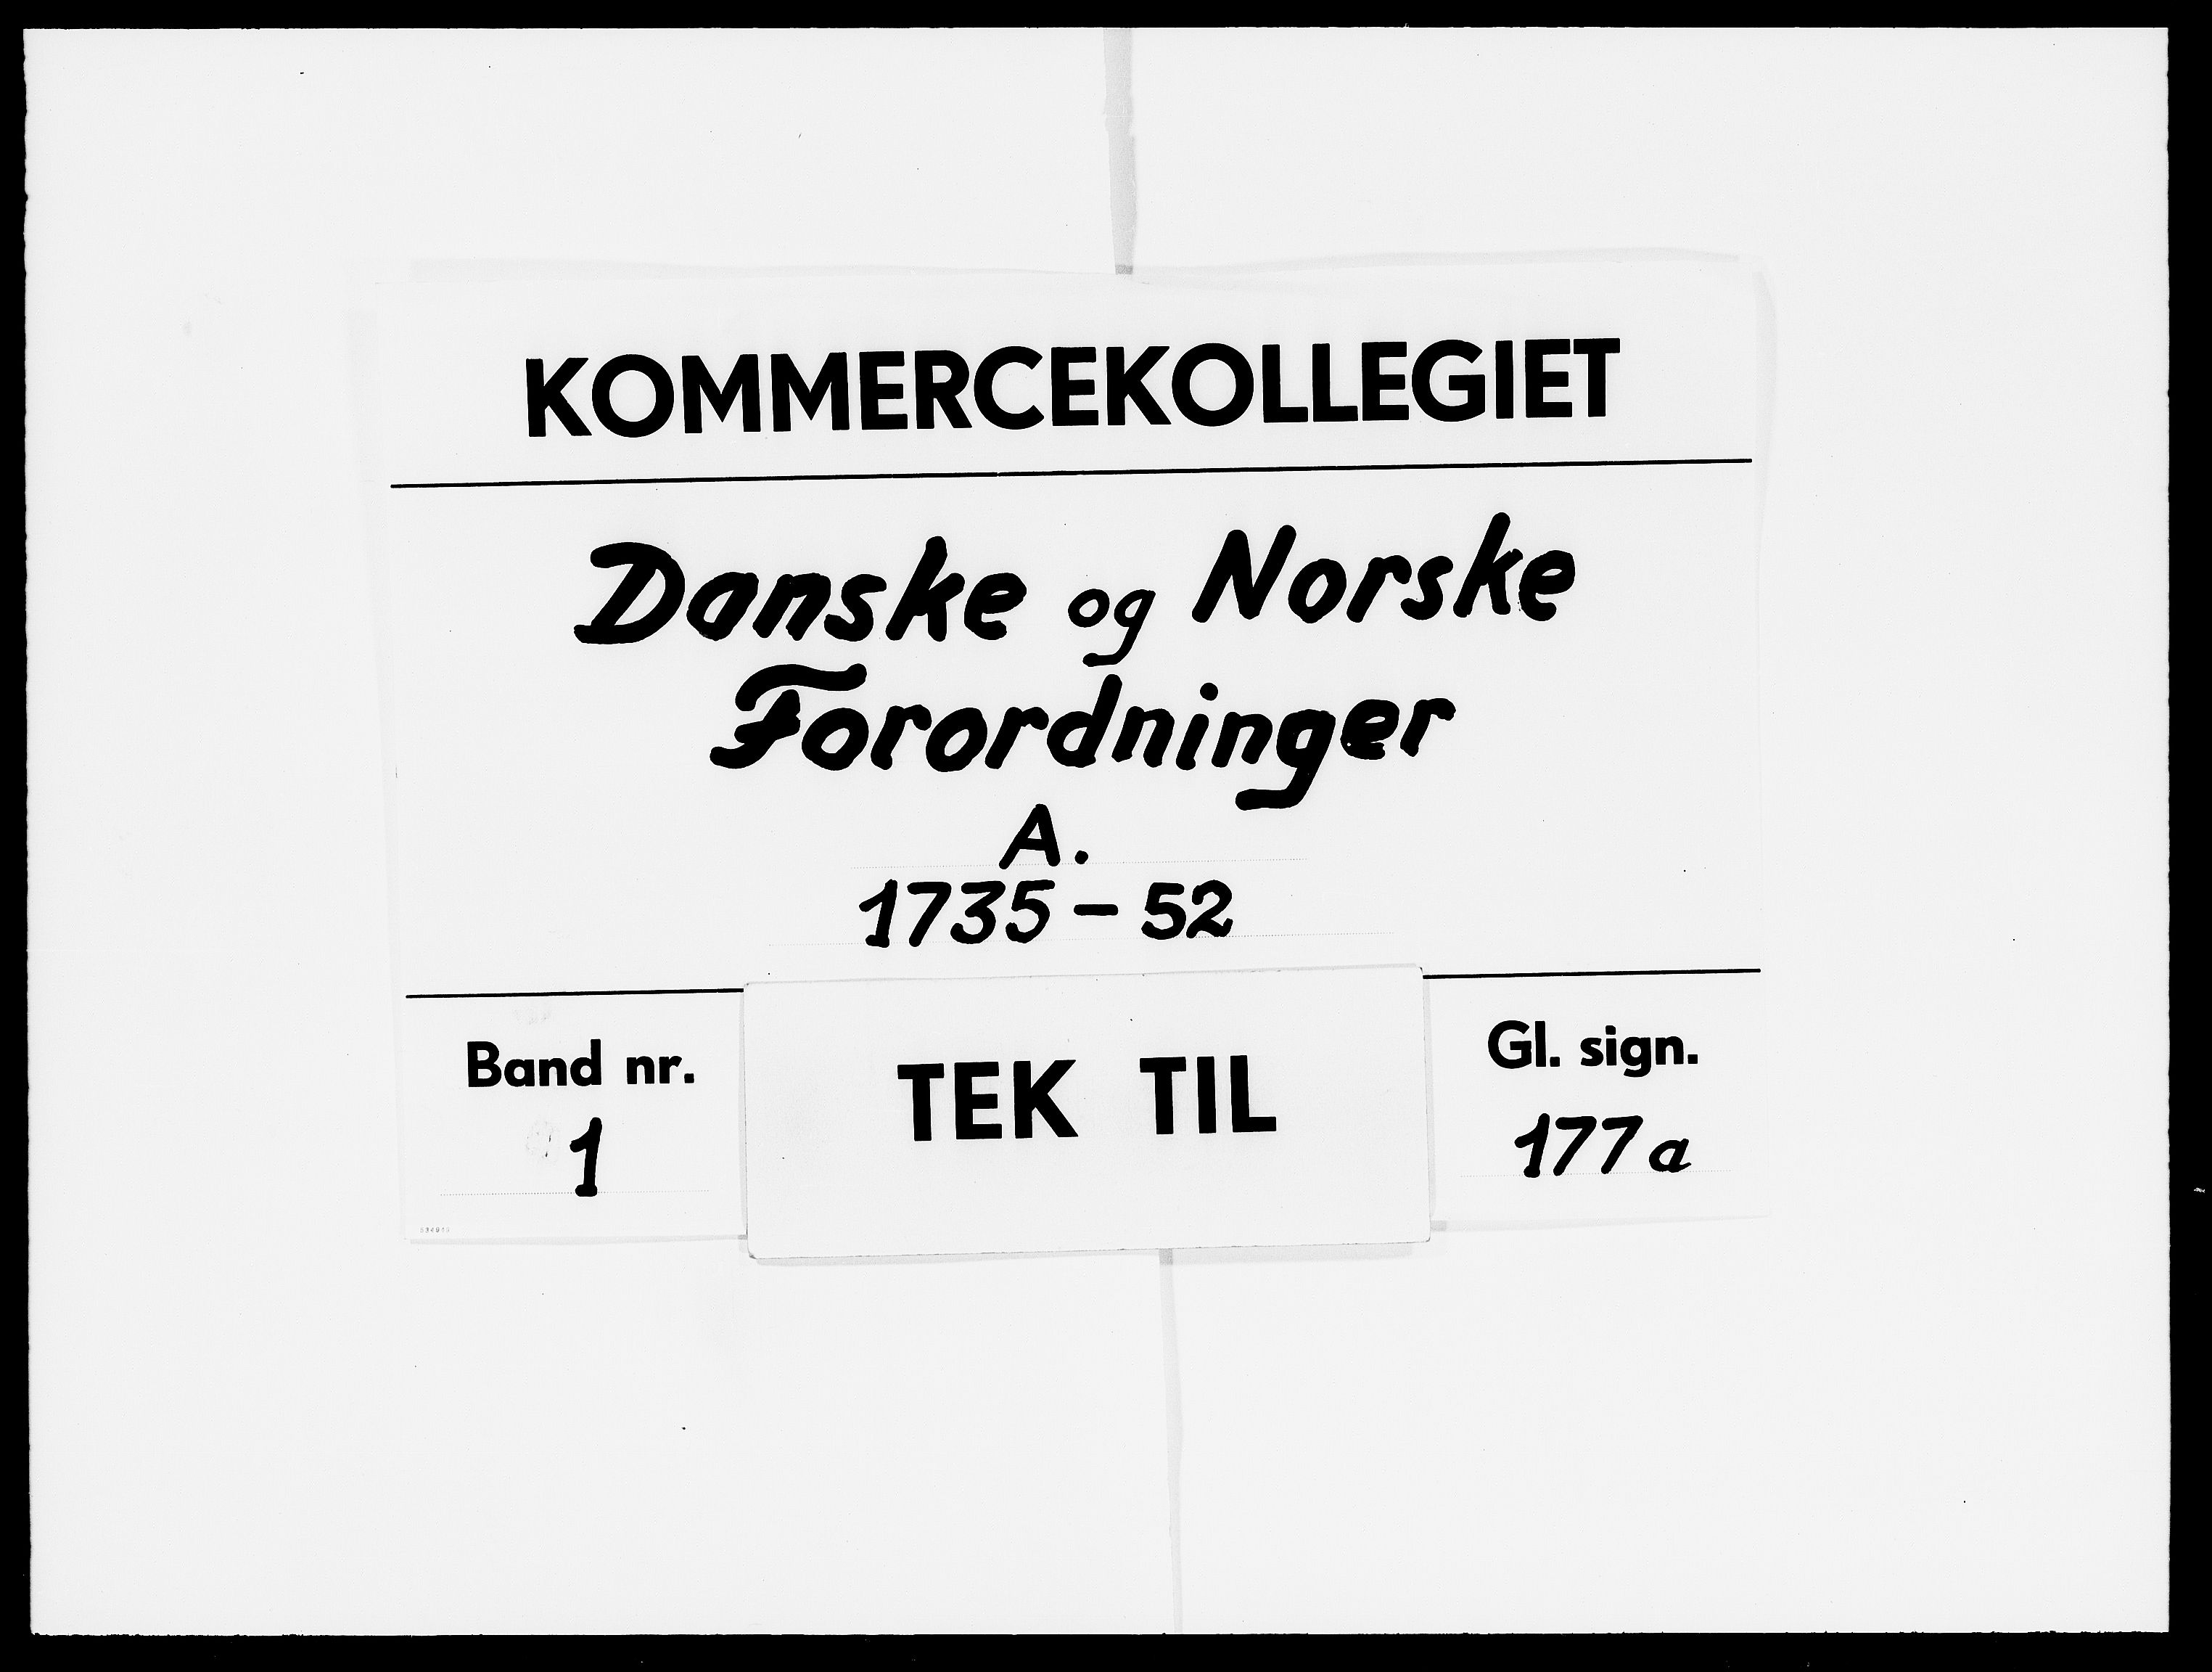 DRA, Kommercekollegiet, Dansk-Norske Sekretariat, -/16: Danske og norske forordninger A, 1735-1752